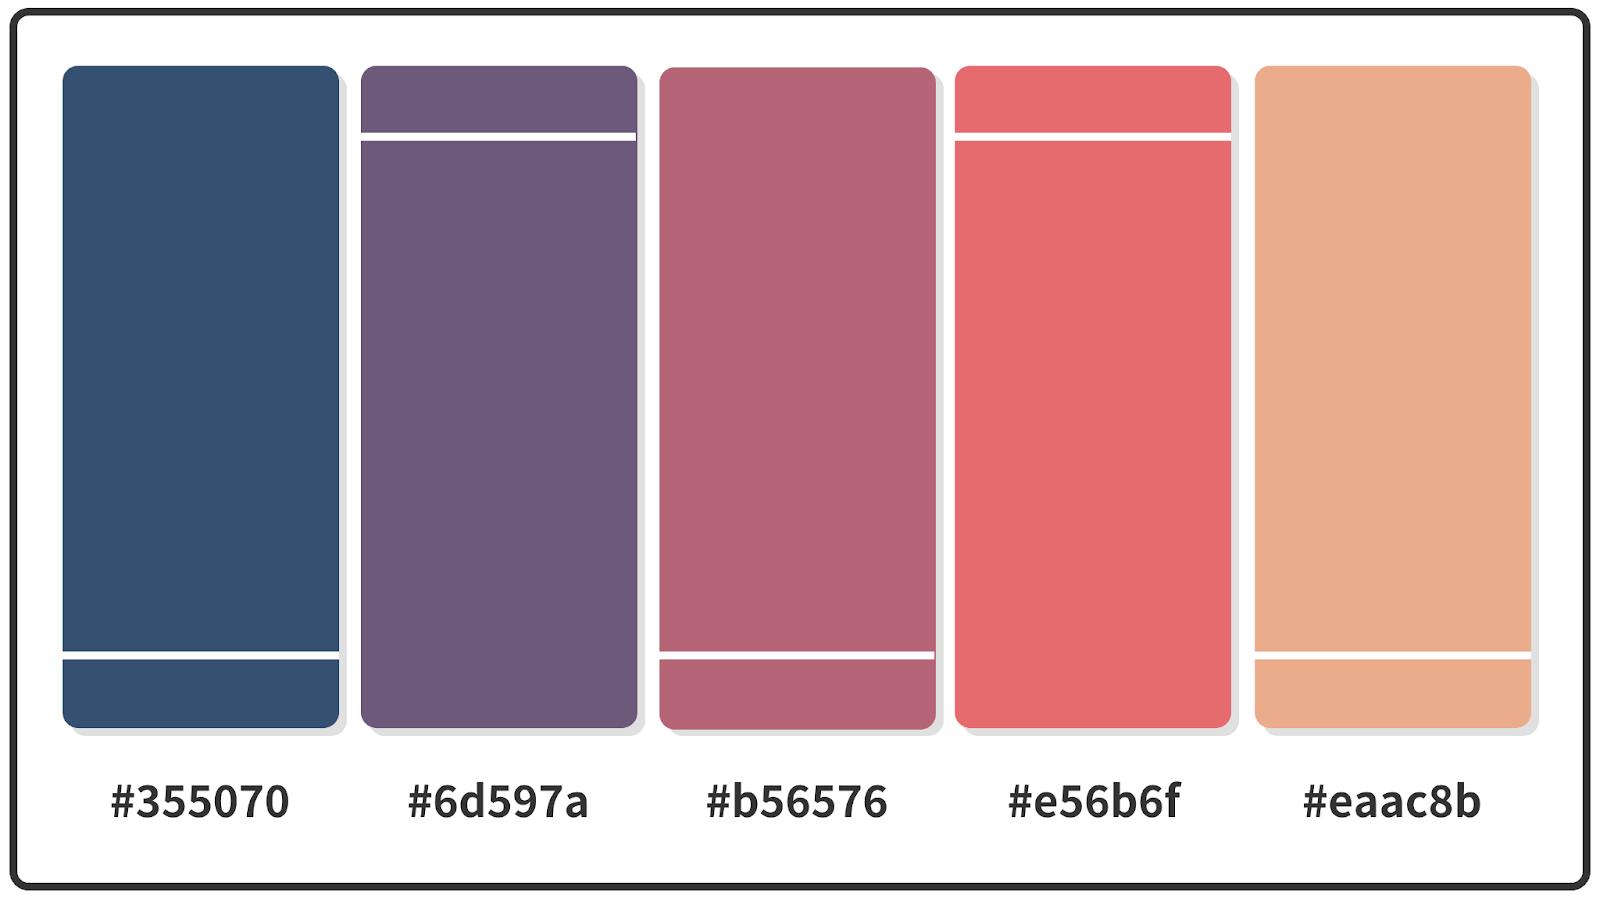 Candy Pink + Rose Desert + Y in Mn Blue Color Palette